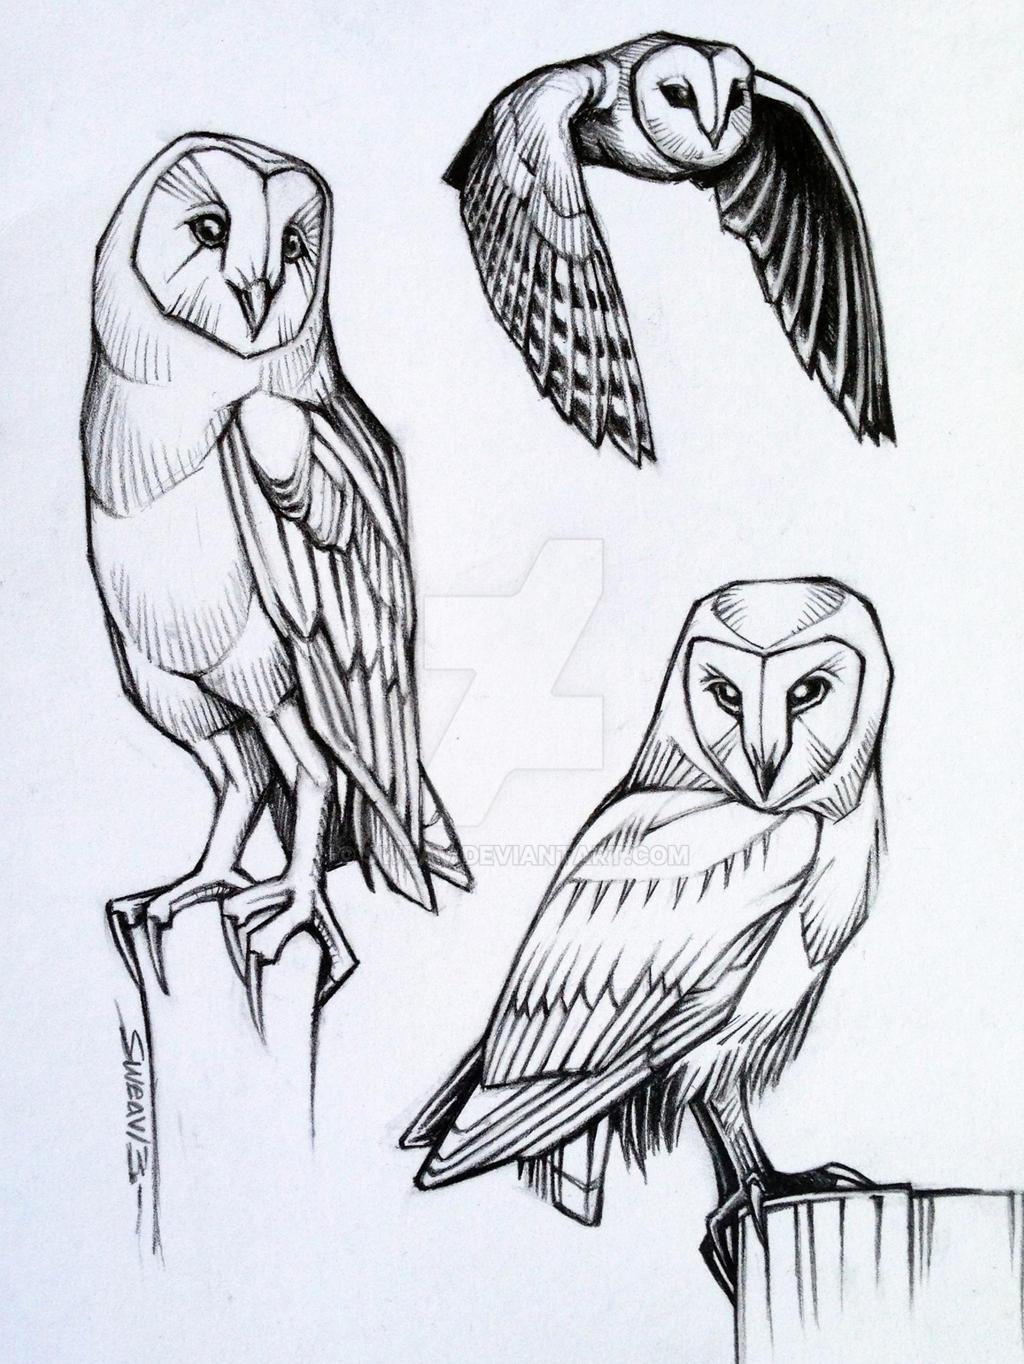 Owl Line Drawing Tattoo : Barn owl studies by sweav on deviantart